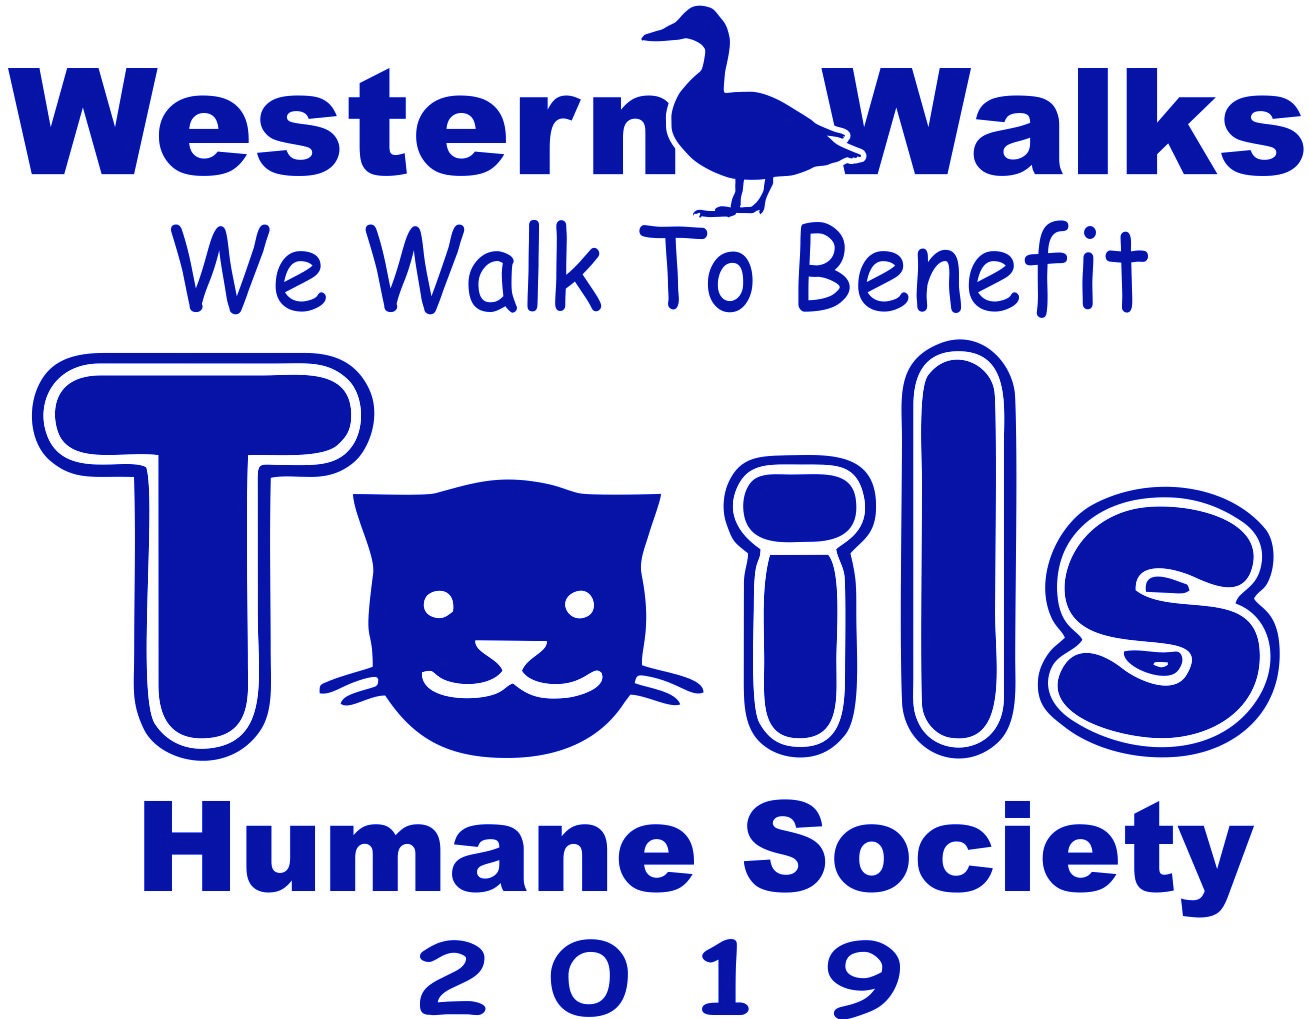 Western Walks 2019 Logo